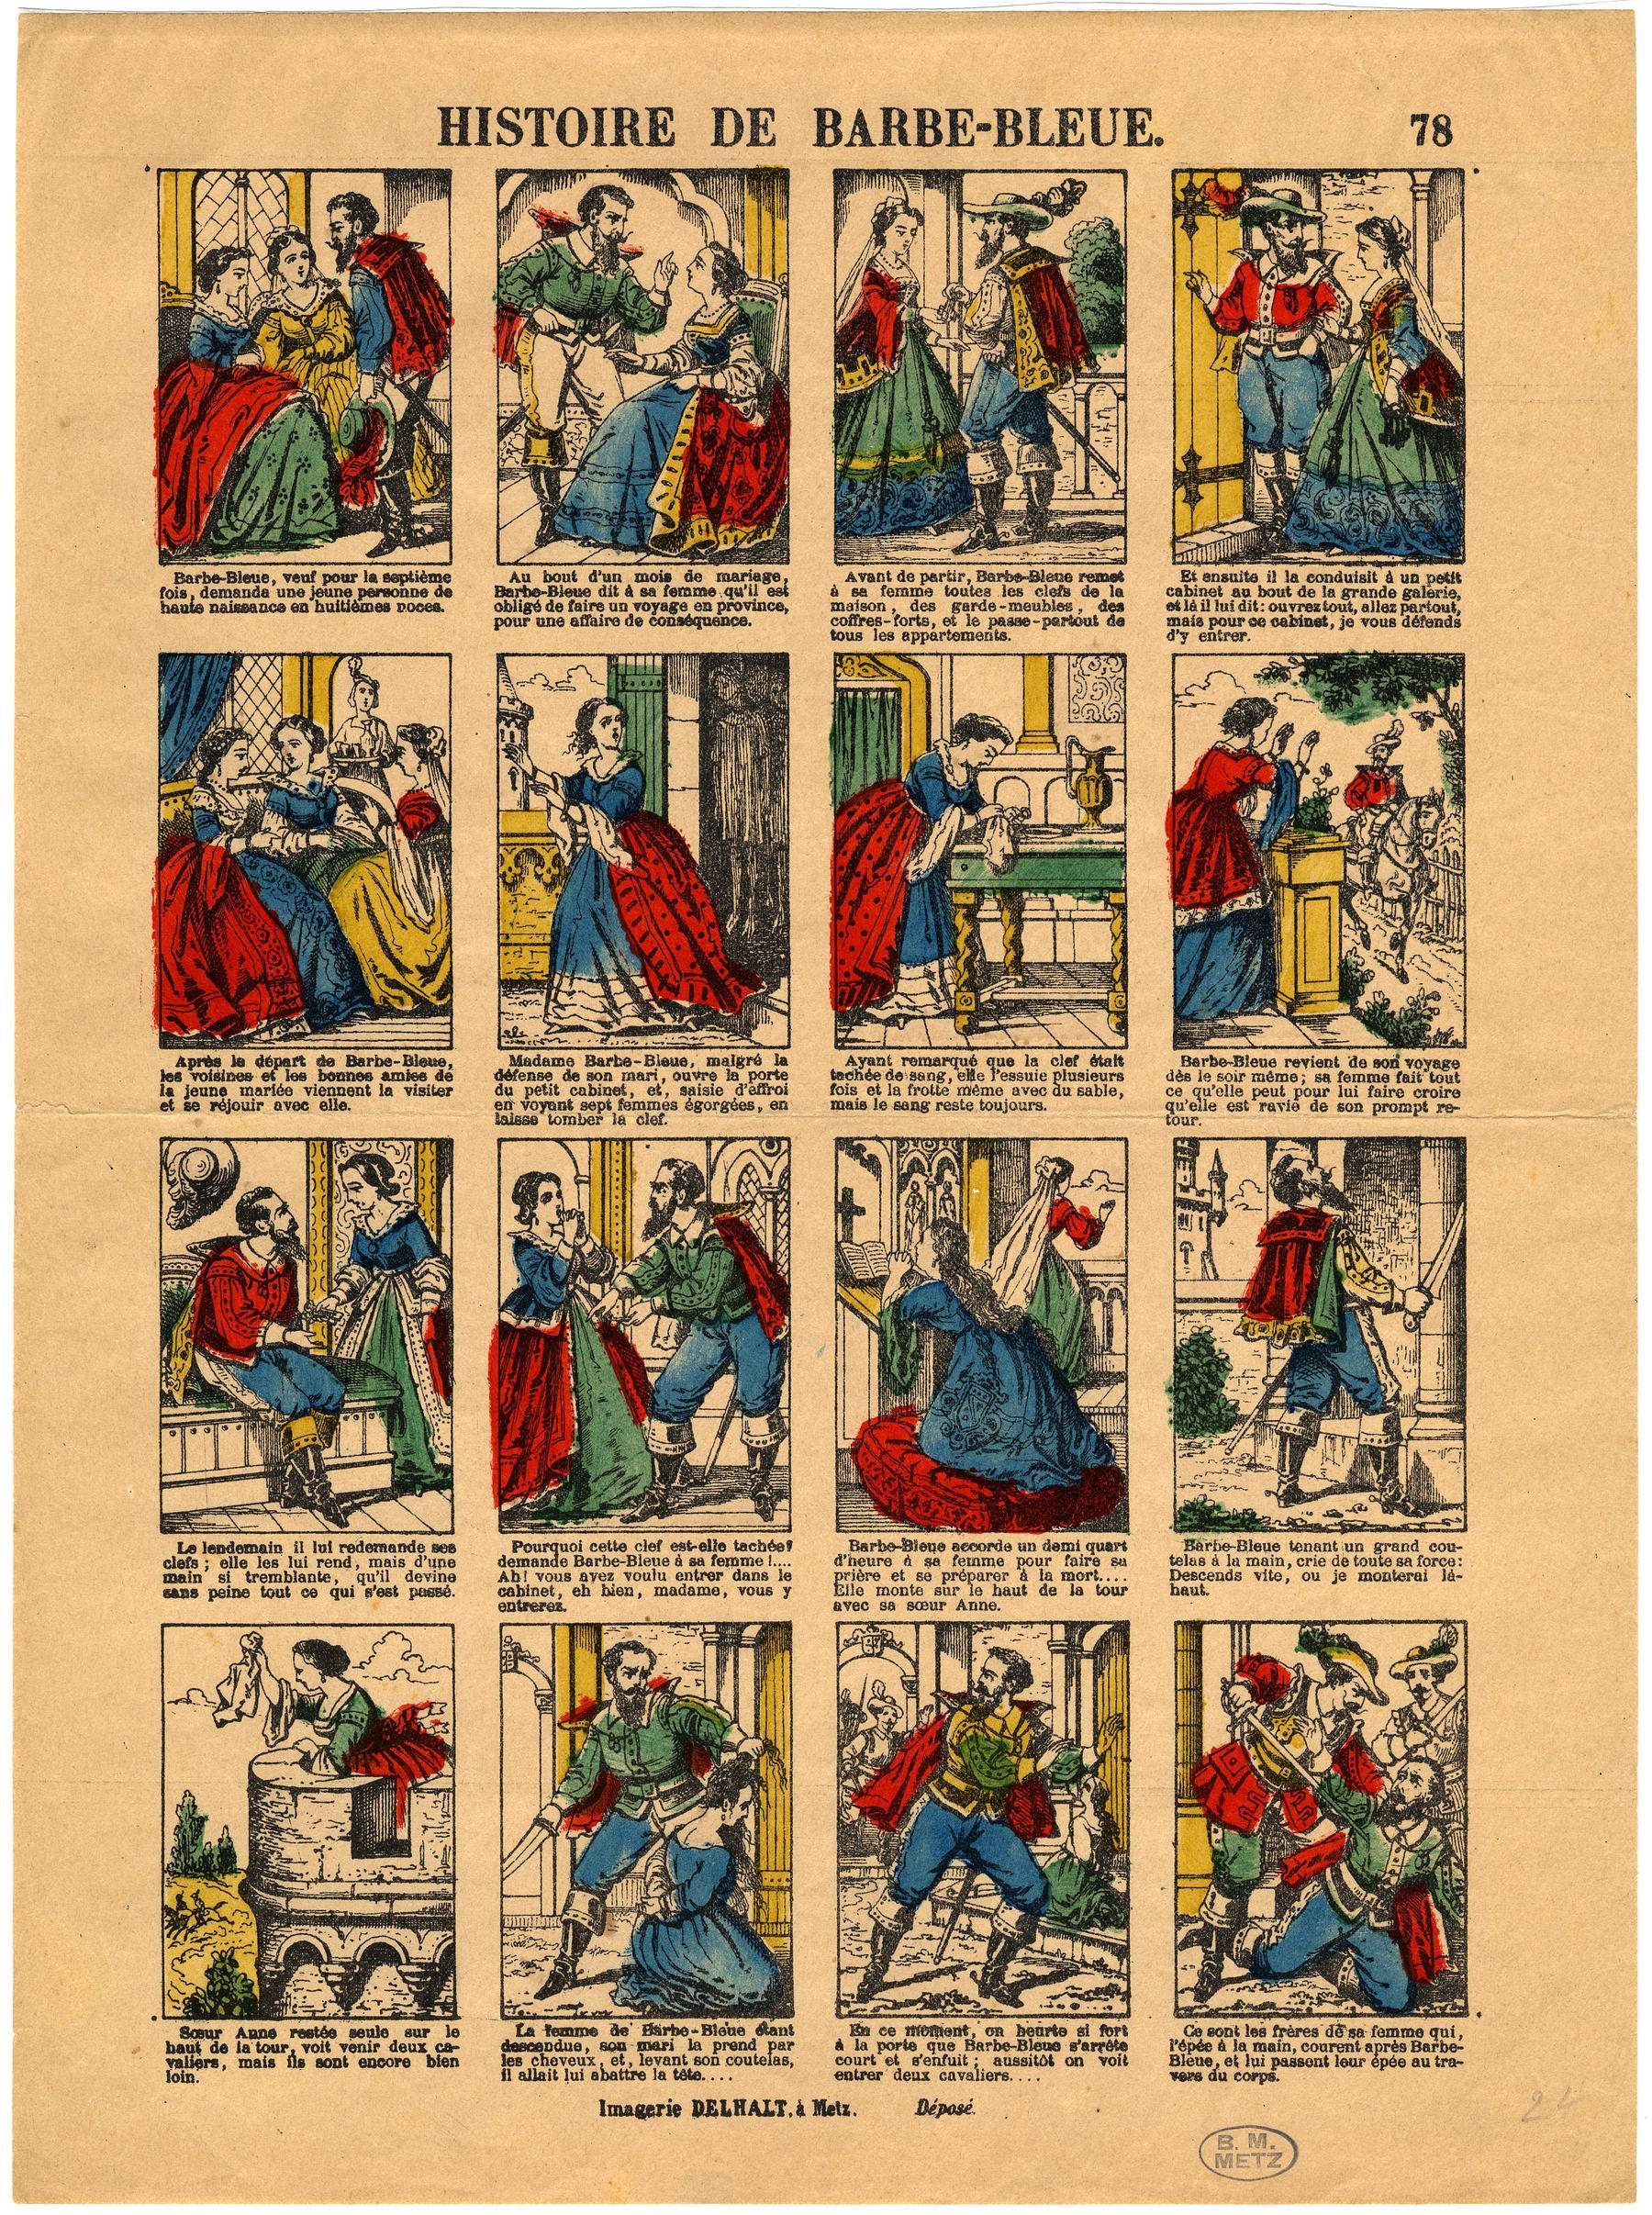 Contenu du Histoire de Barbe-Bleue